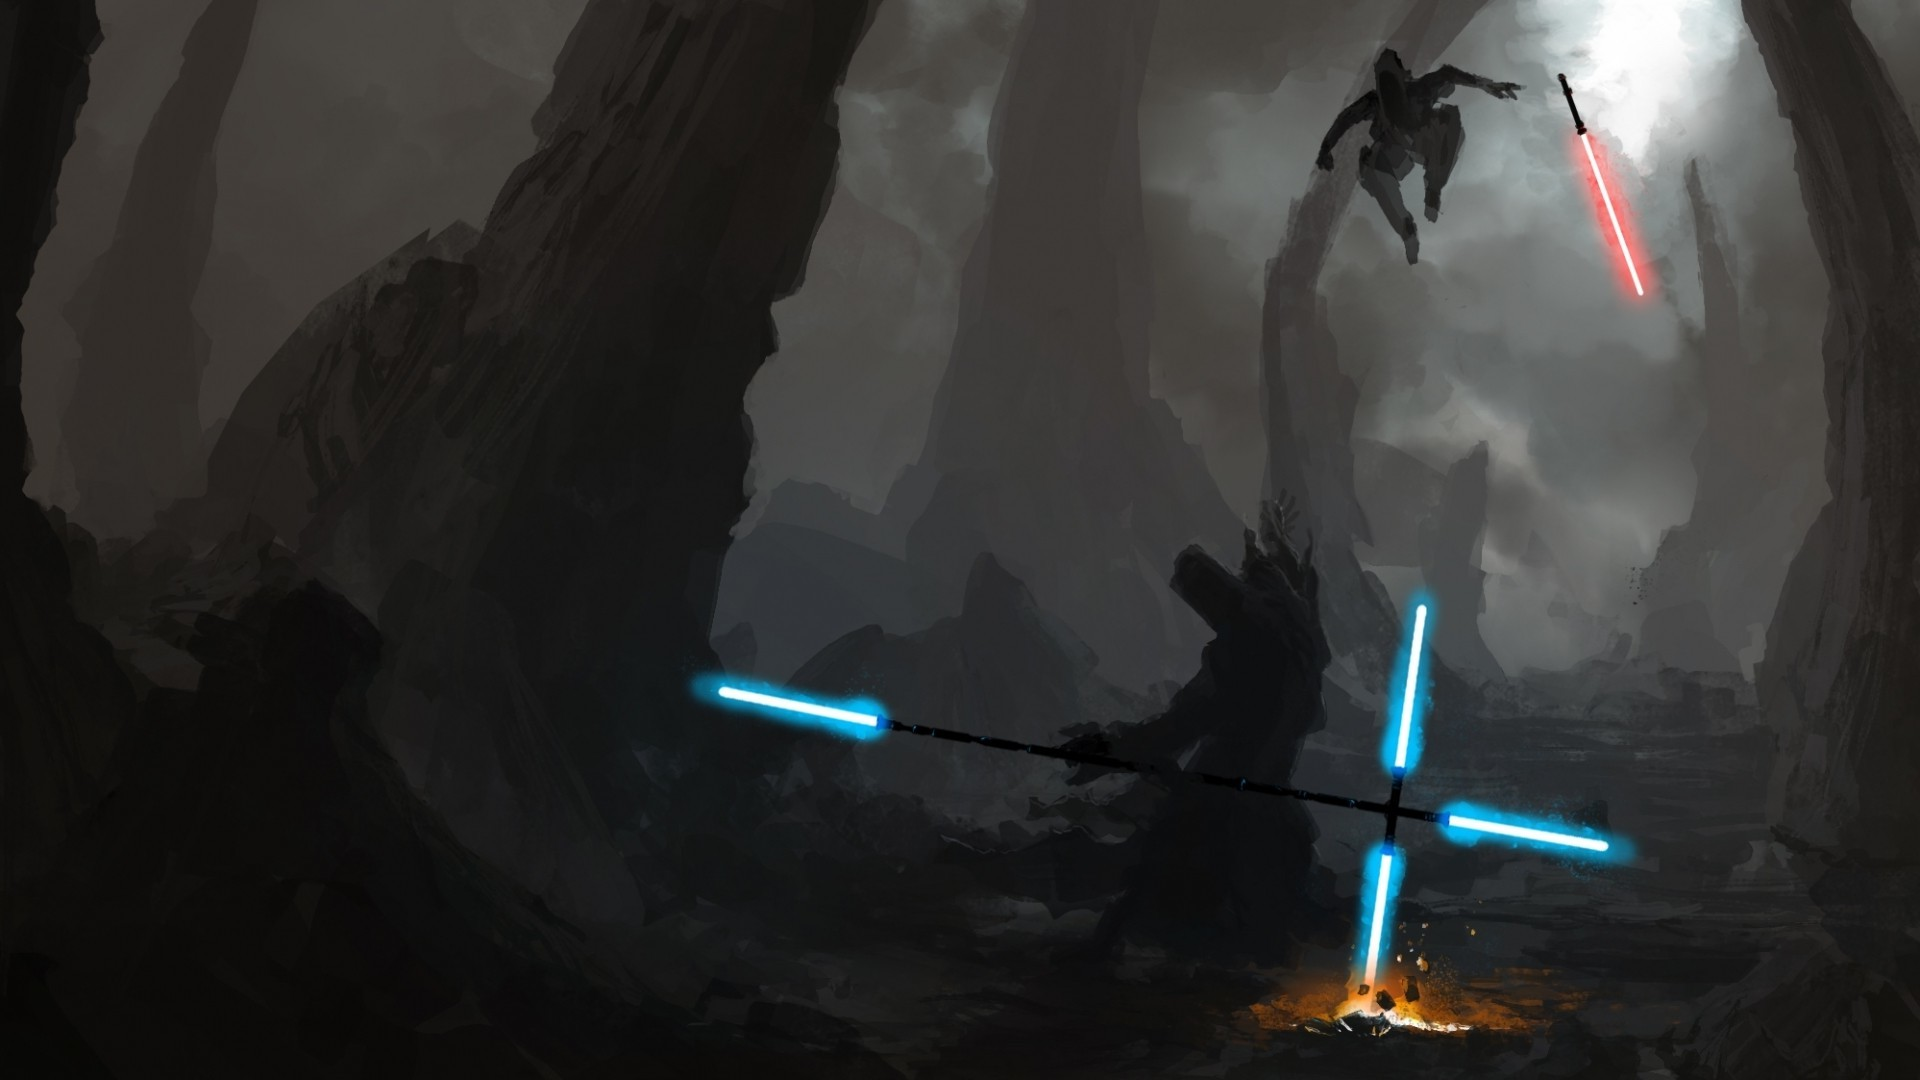 Star Wars, Jedi, Sith, Lightsaber Wallpapers HD / Desktop and Mobile  Backgrounds